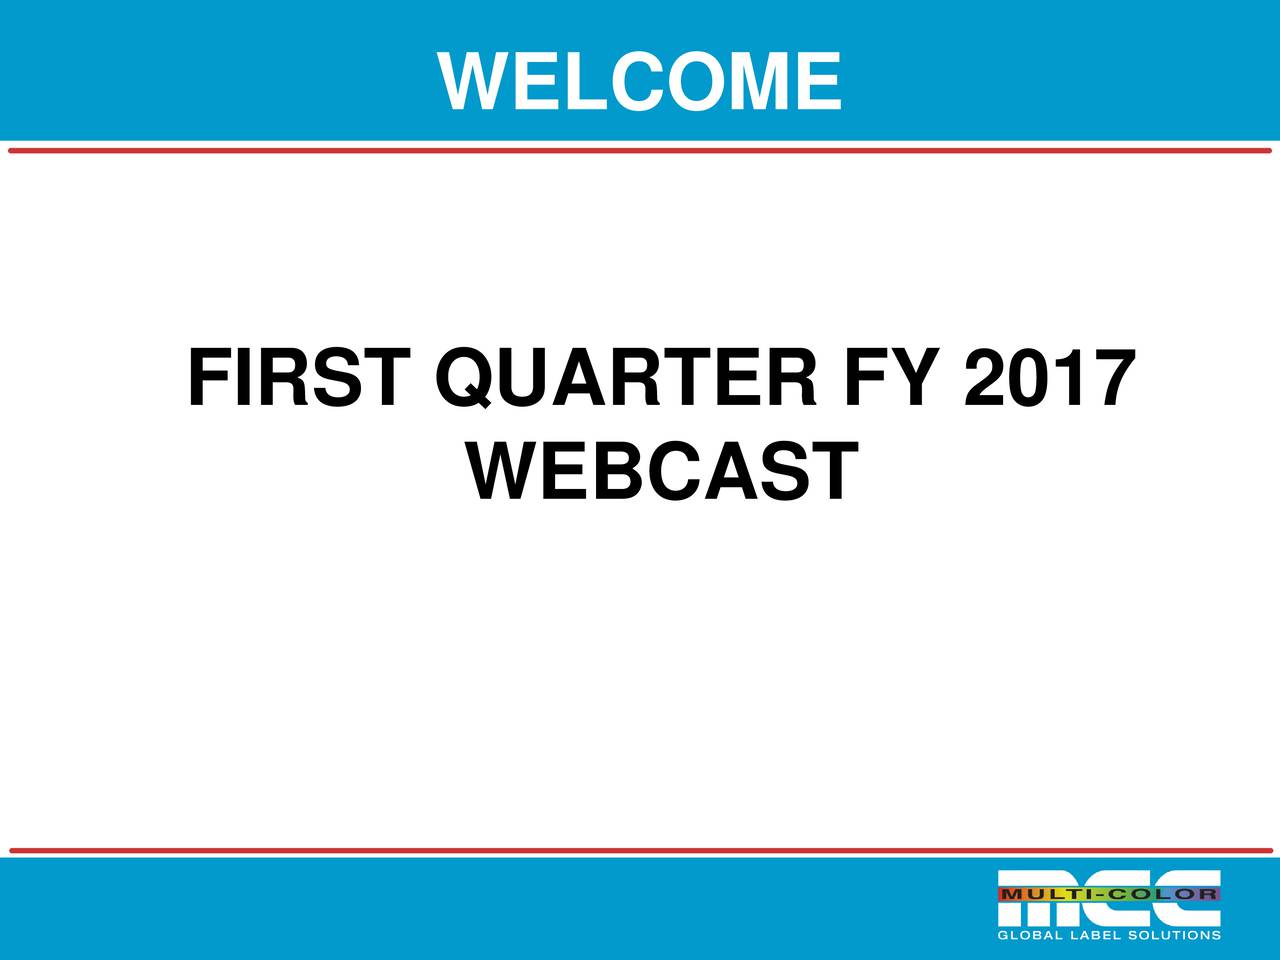 FIRST QUARTER FY 2017 WEBCAST